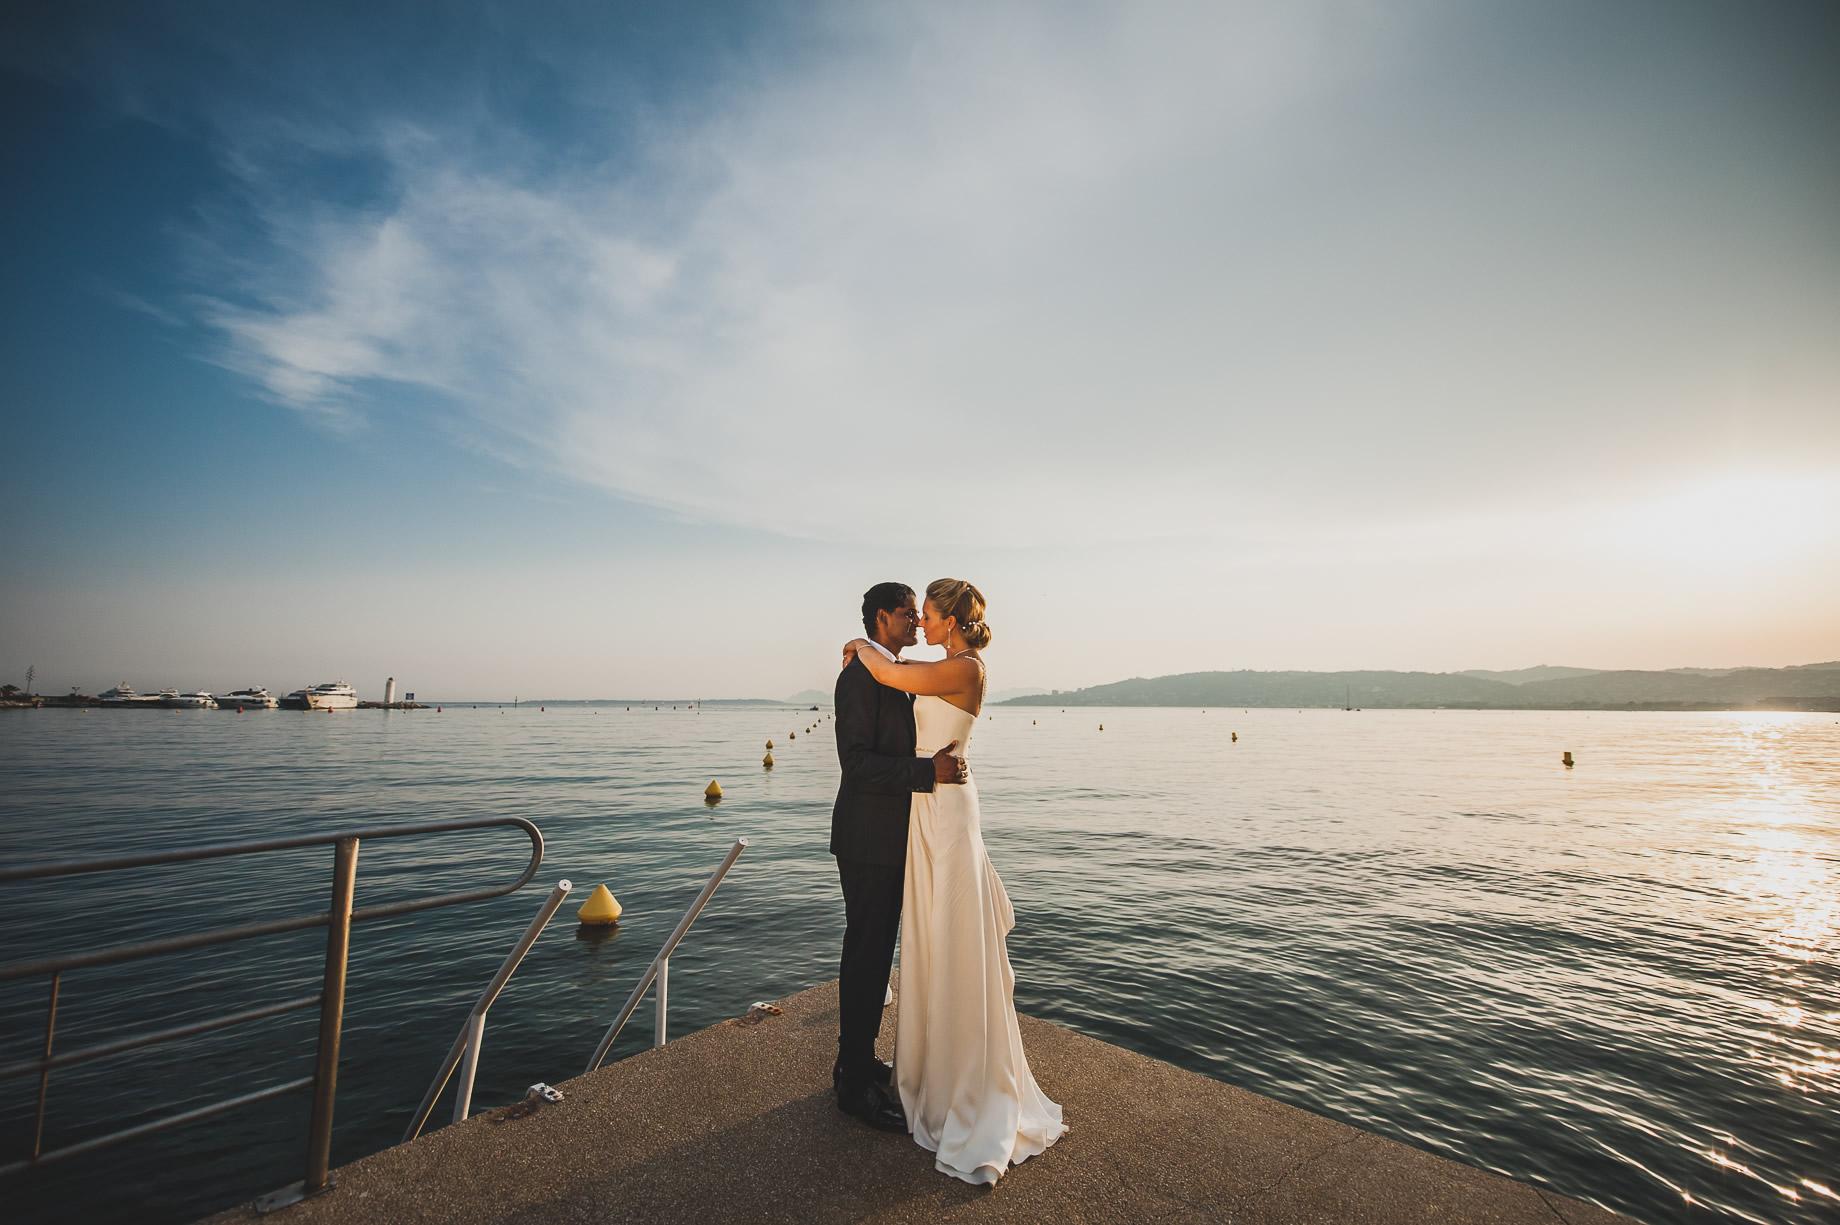 Jen and Priyan's Wedding - A Preview 011